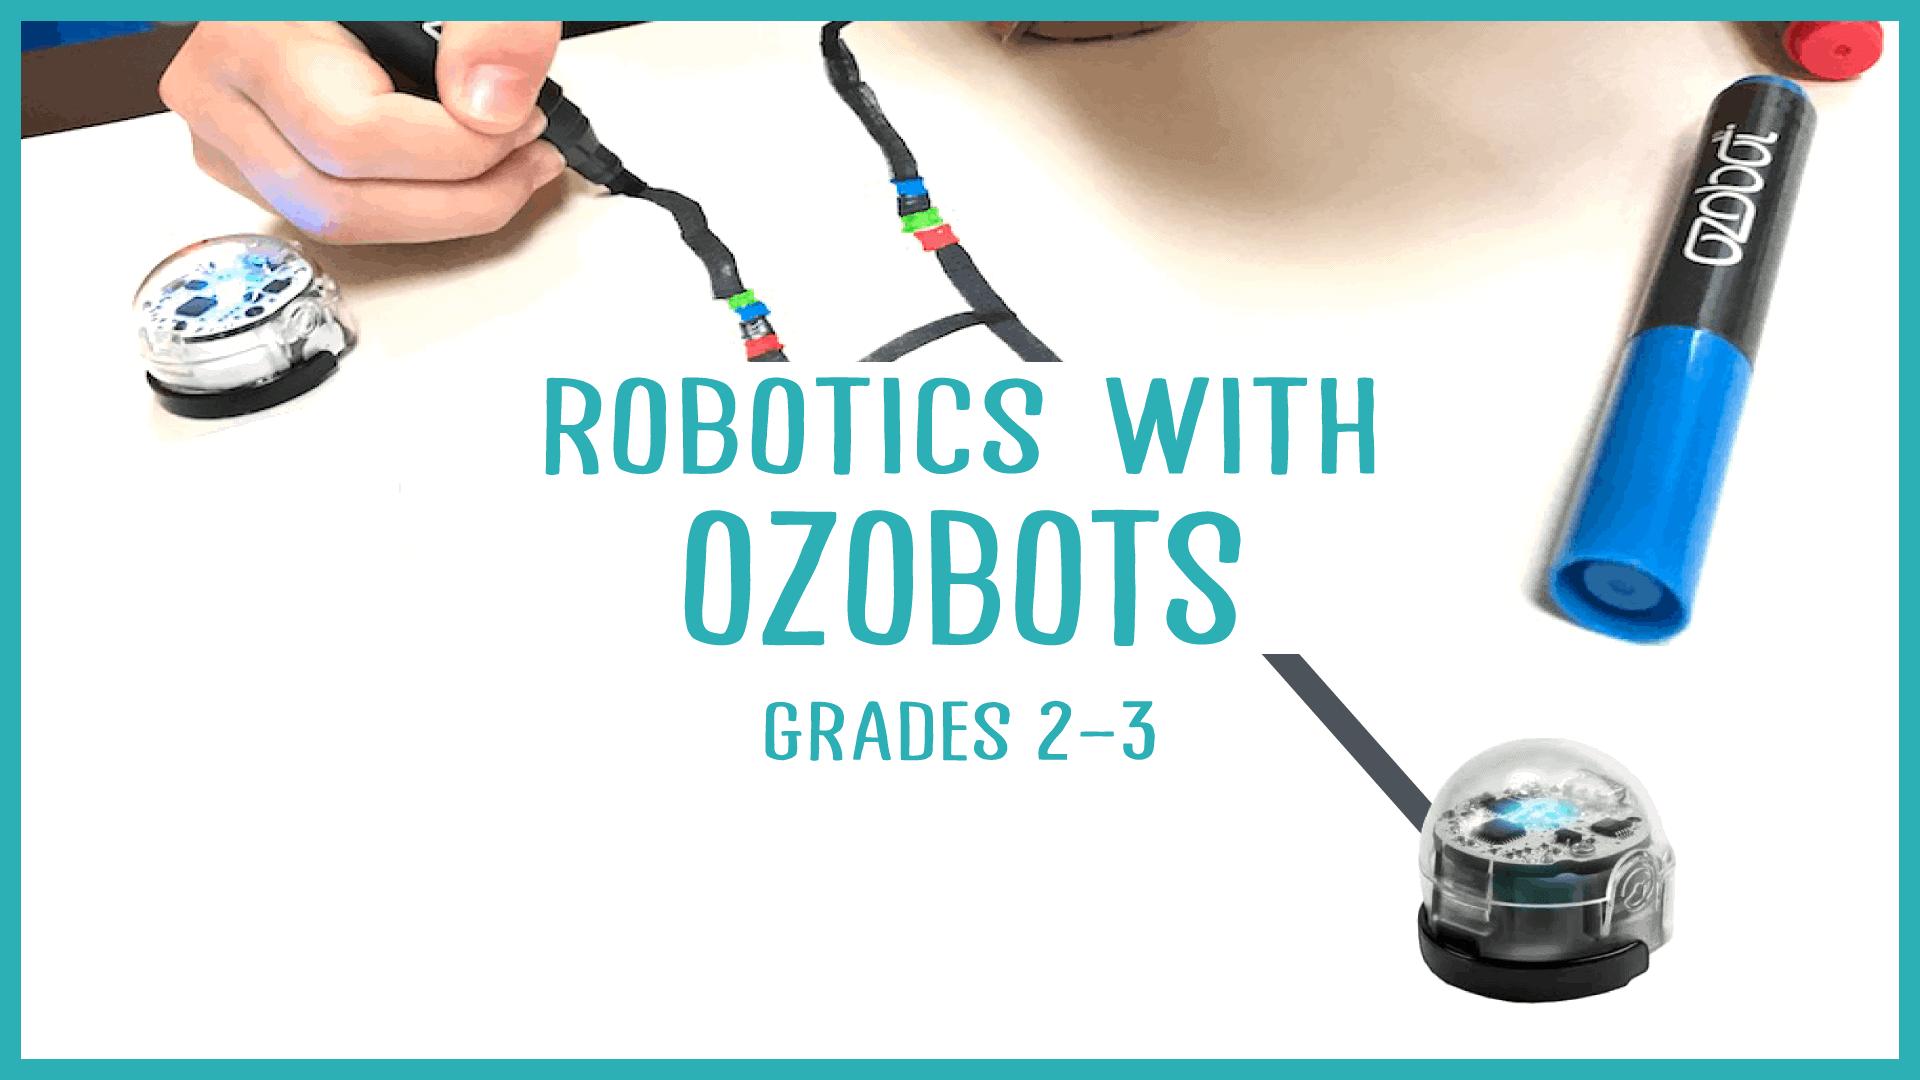 Robotics with Ozobots